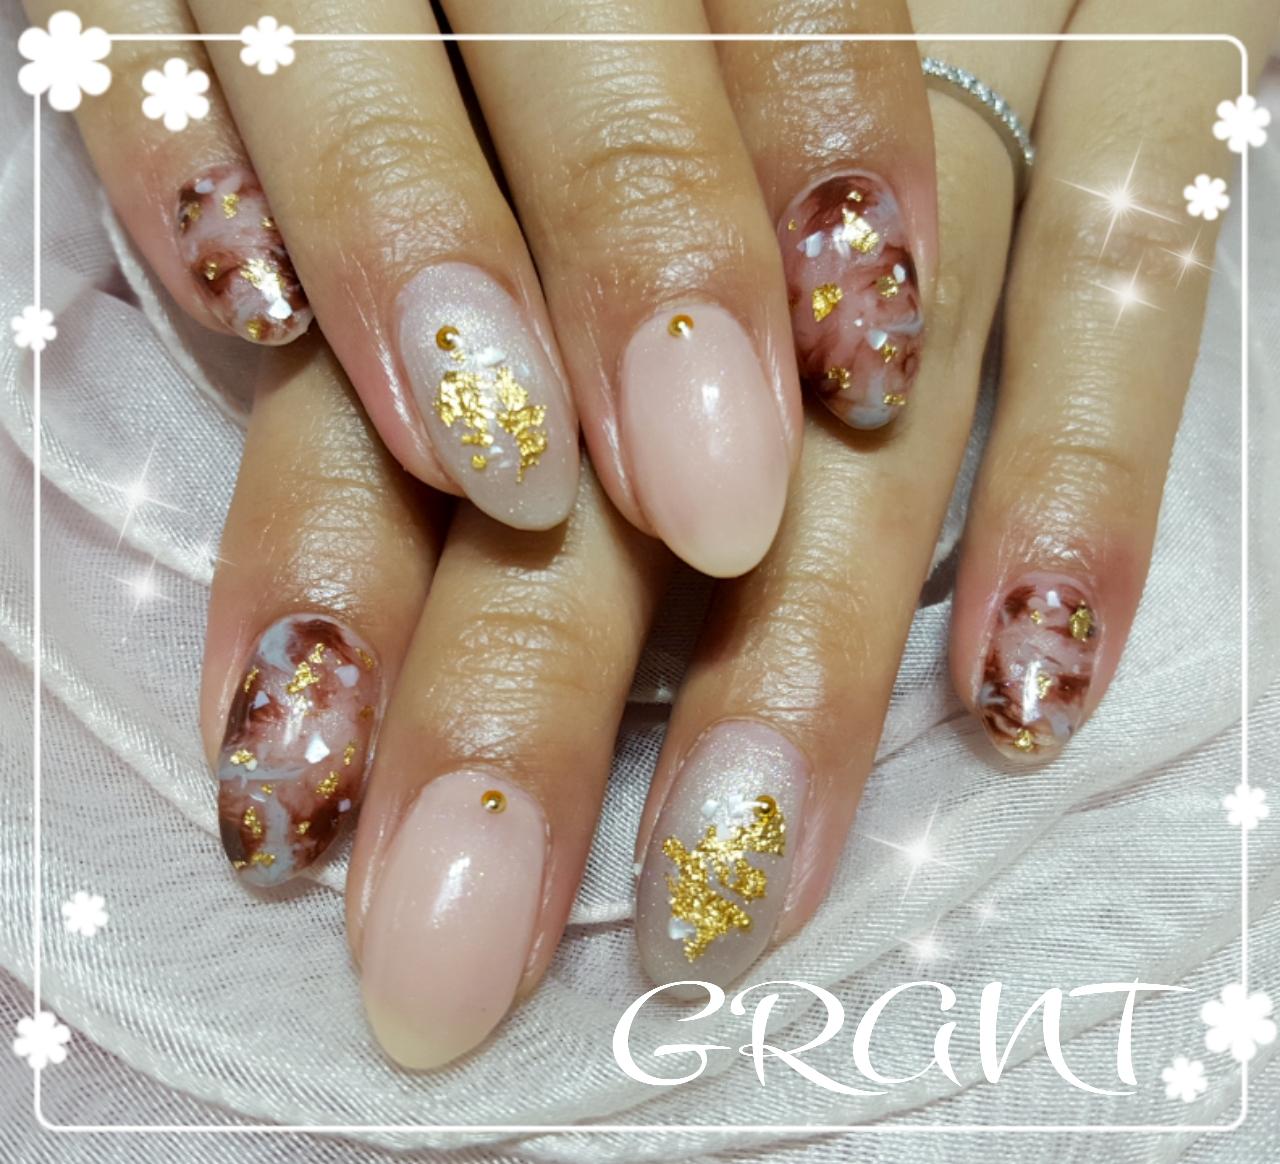 http://www.nail-grant.com/16-10-31-18-28-10-856_deco.jpg